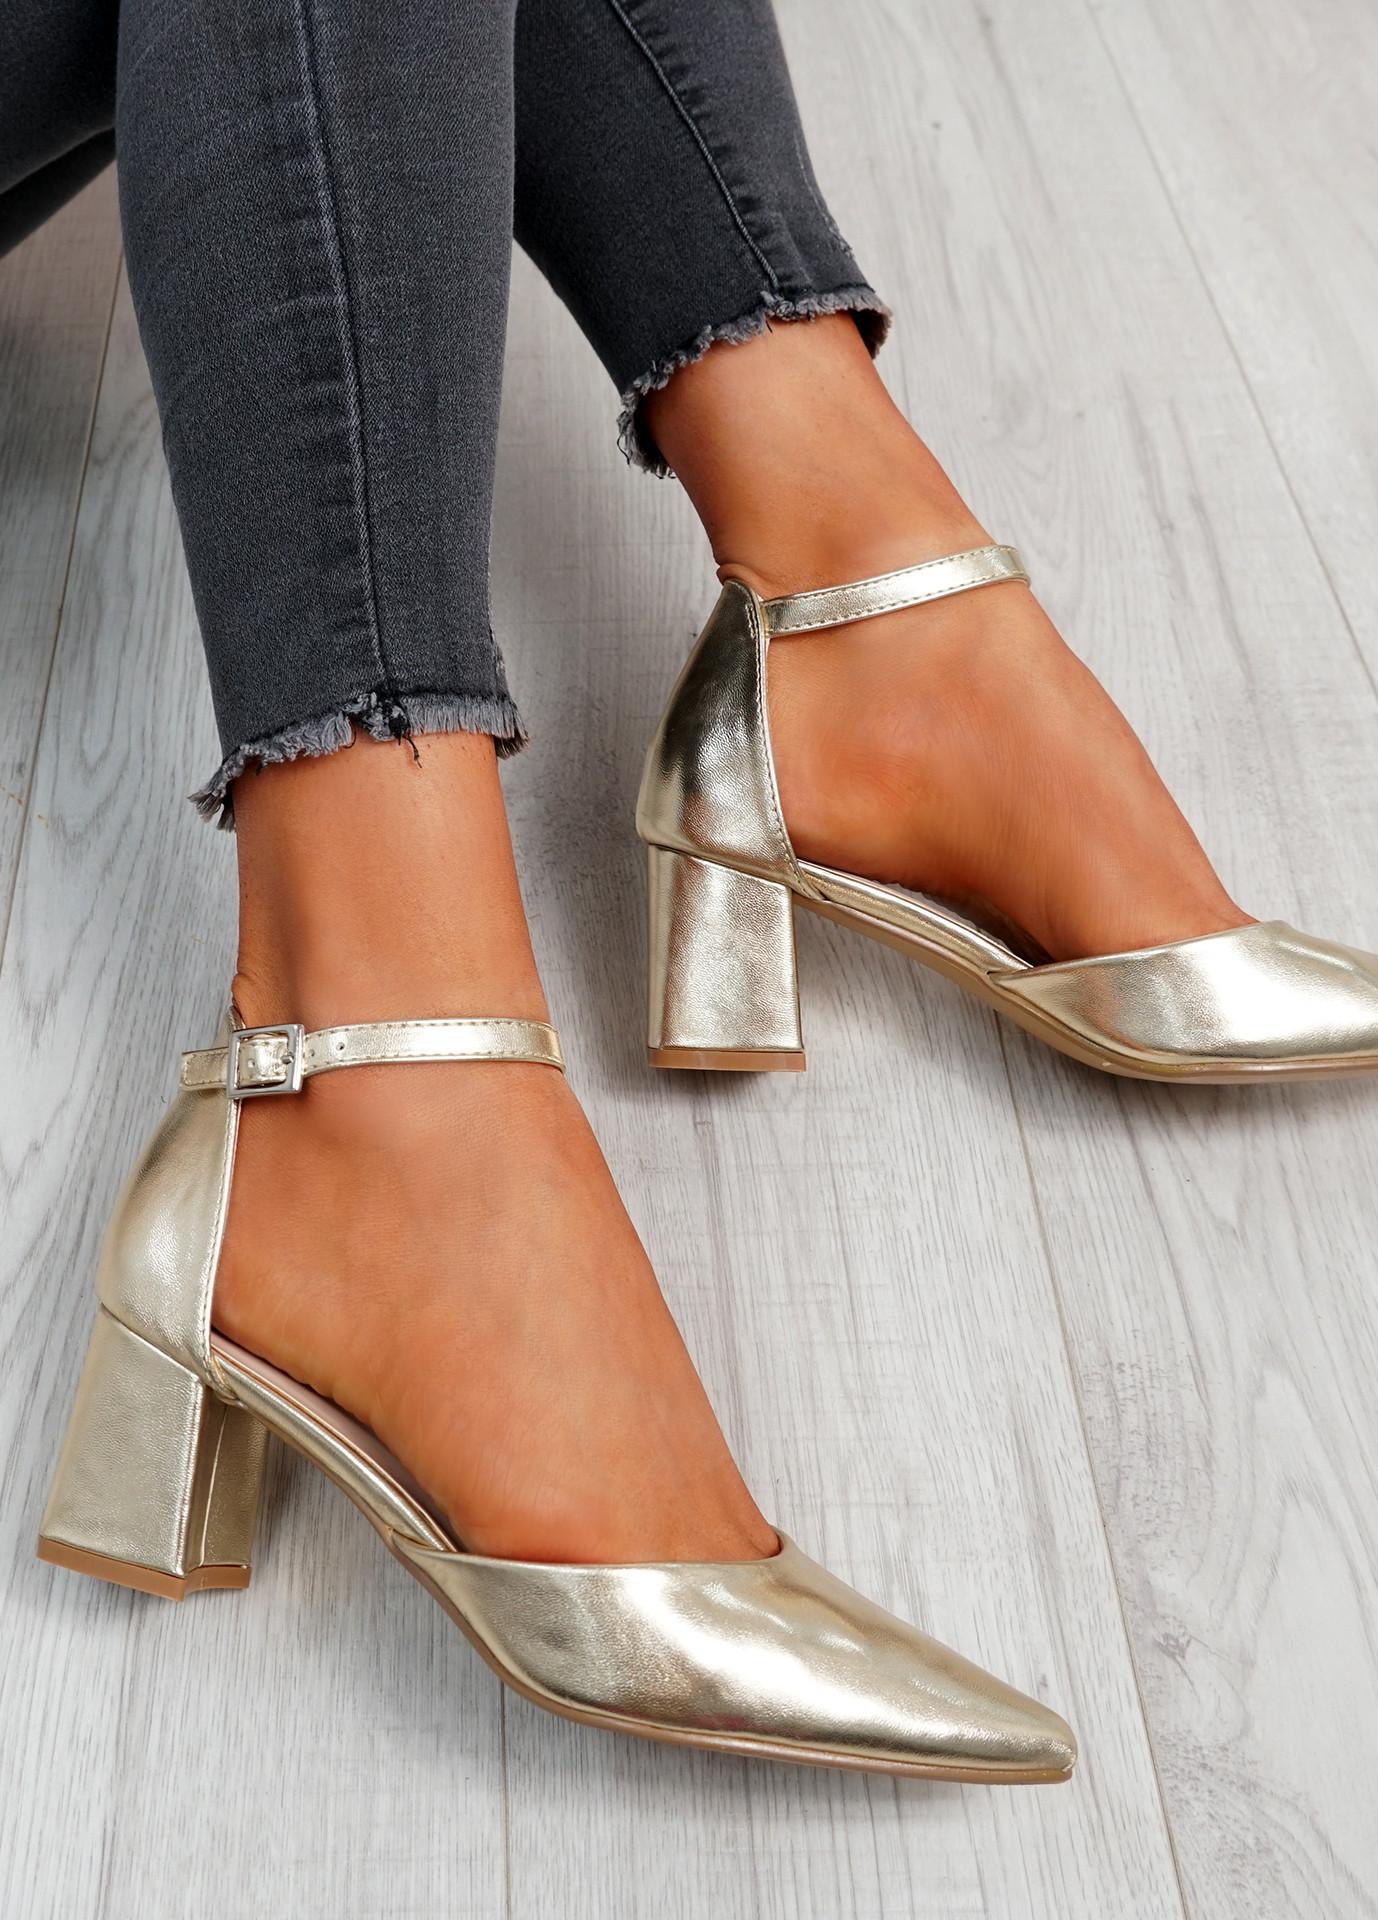 Mya Gold Block Heel Ankle Strap Pumps